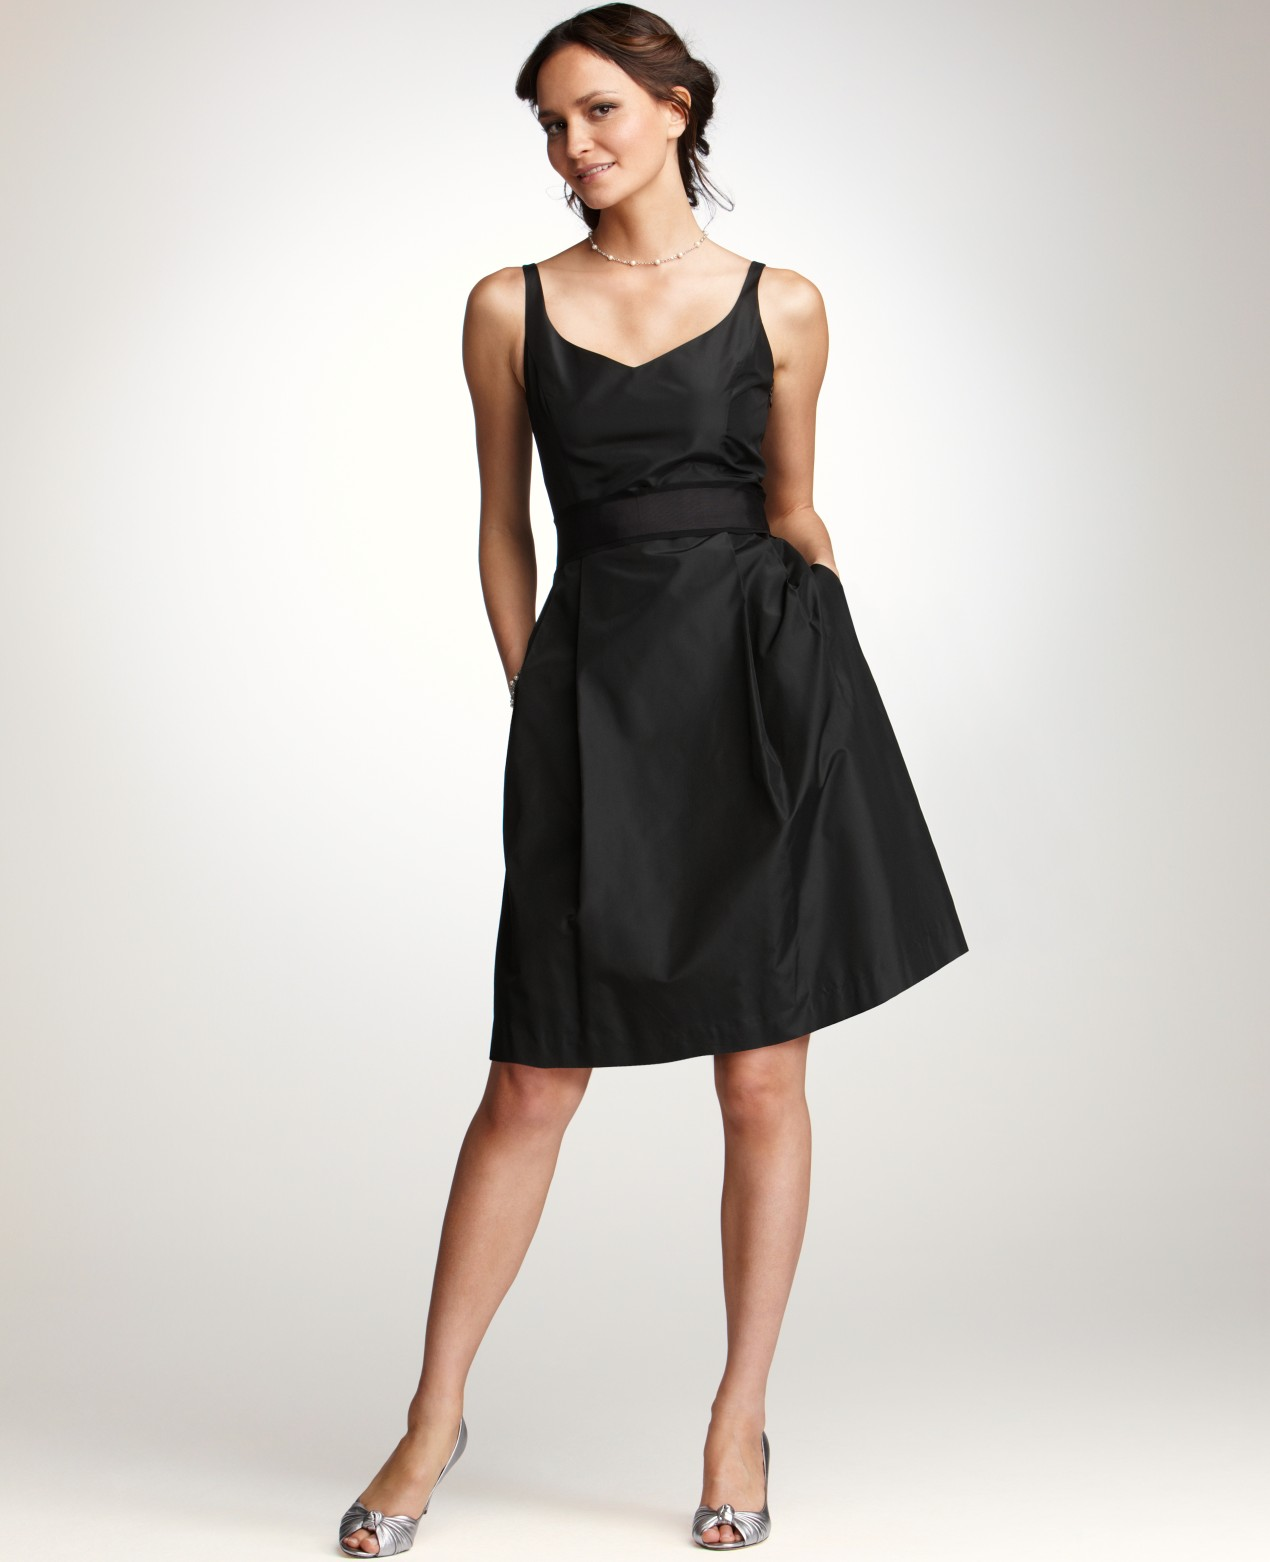 Adrienne Dress In Silk Taffeta: Ann Taylor Silk Taffeta Vneck Bridesmaid Dress In Black